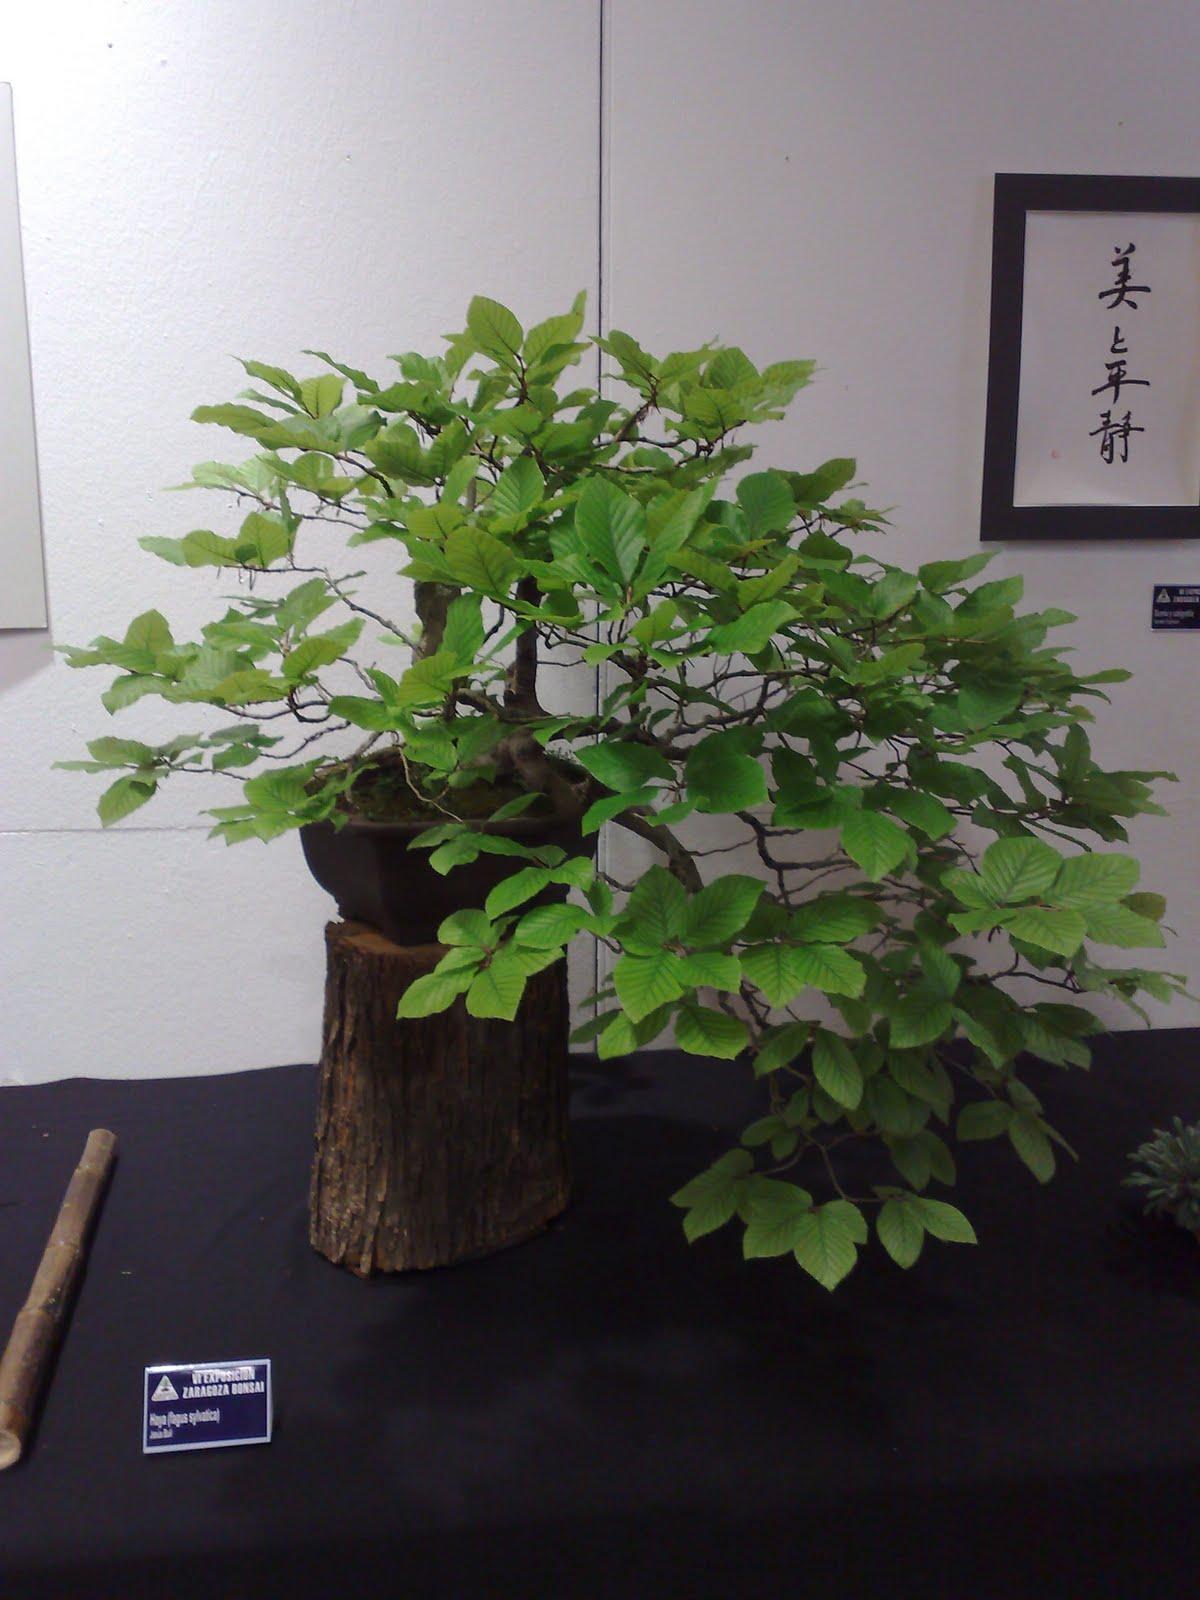 Hobbie bonsai vi exposici n de bonsai de zaragoza - Bonsai de haya ...